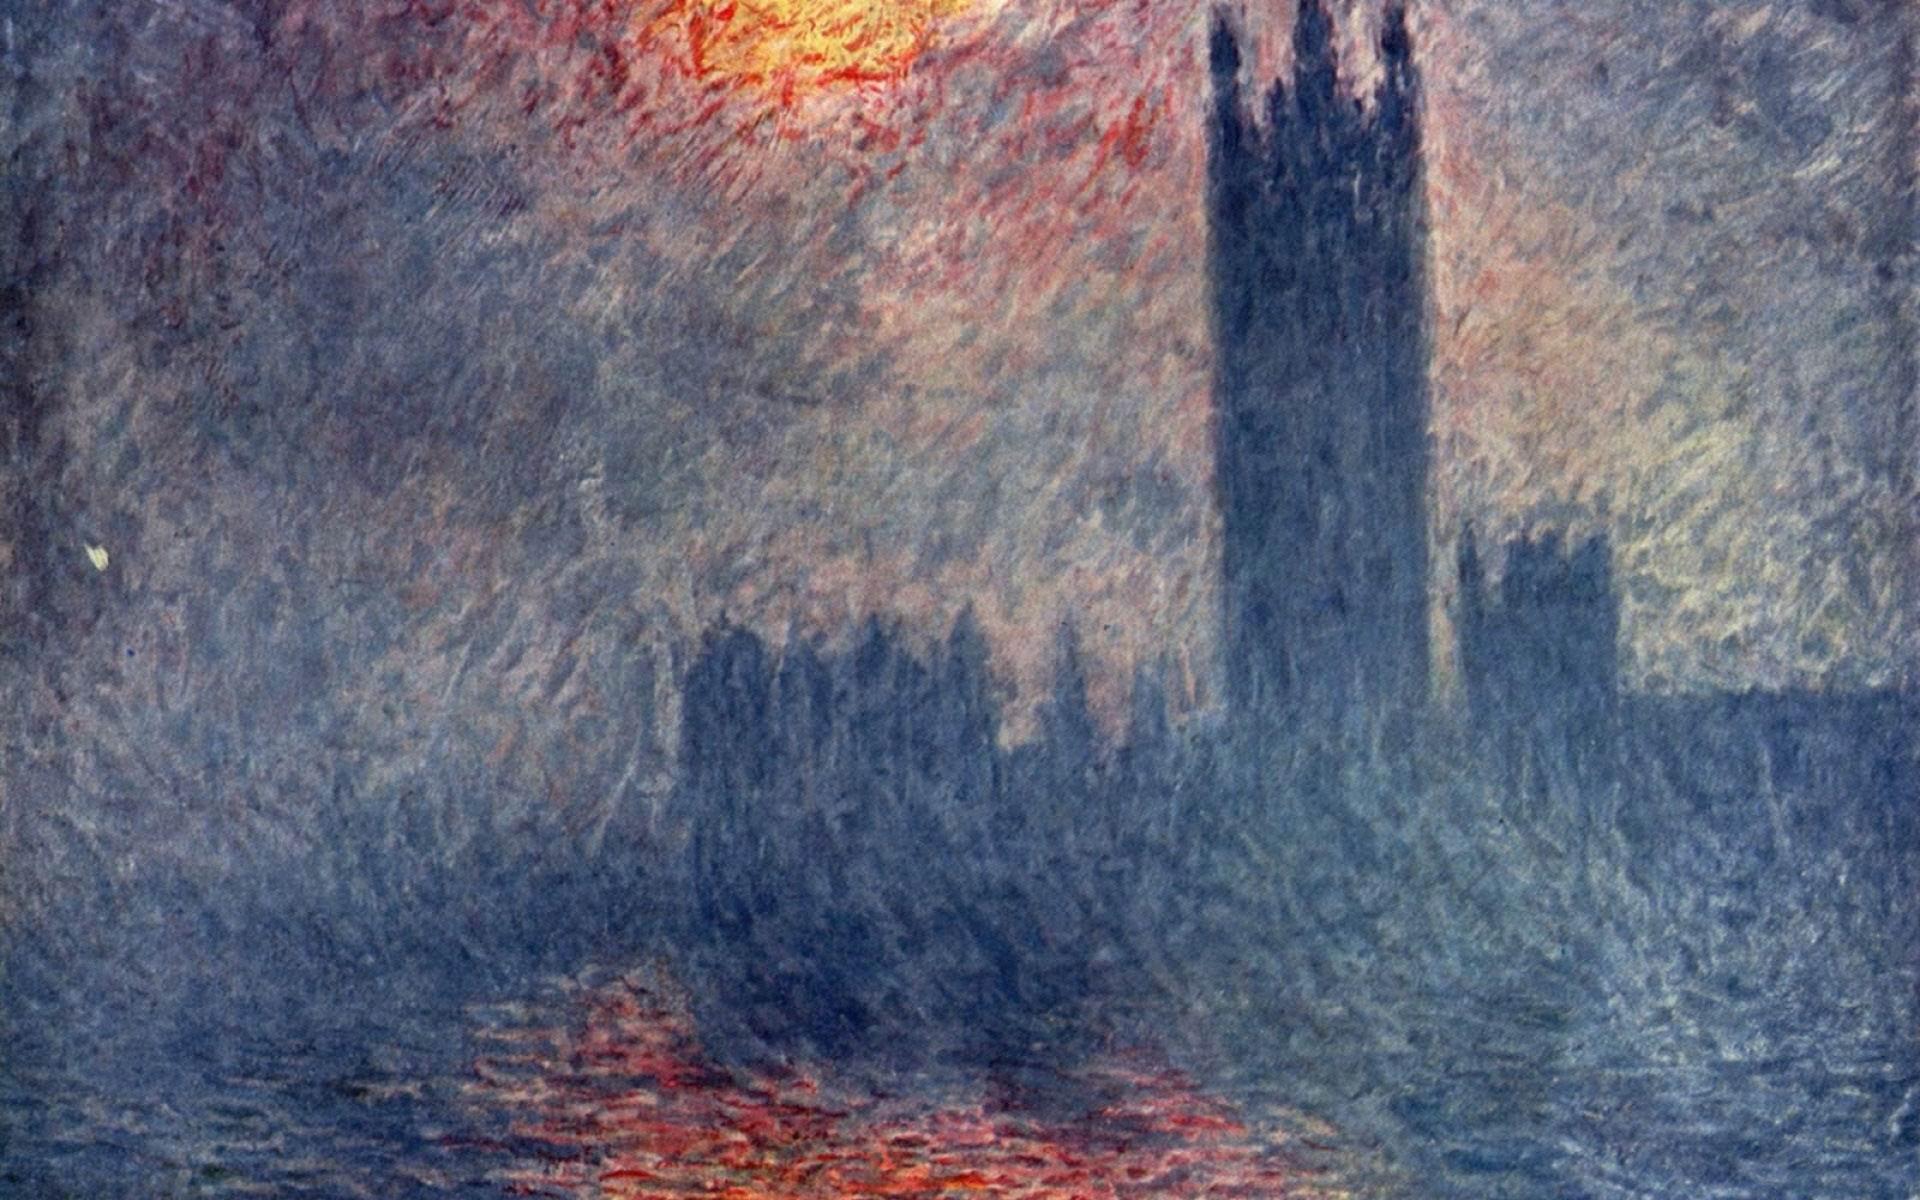 Impressionist painting 1920x1200 Wallpapers 1920x1200 1920x1200